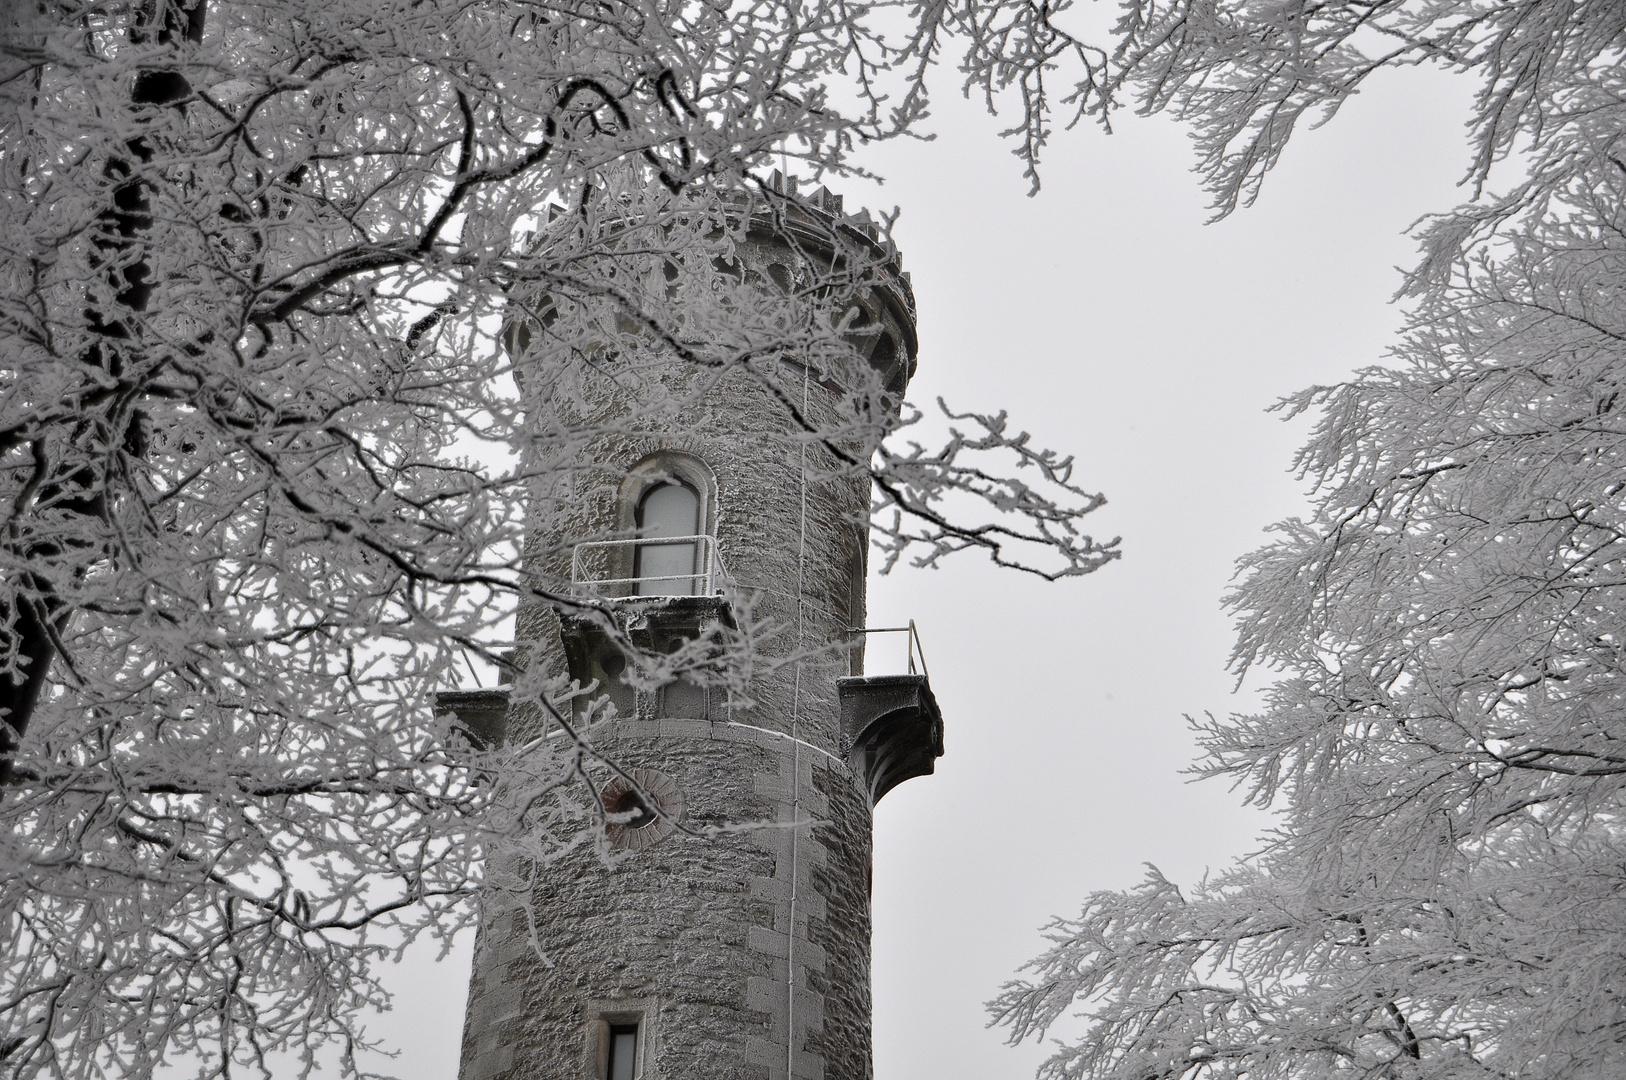 Väterchen Frost in Thüringen